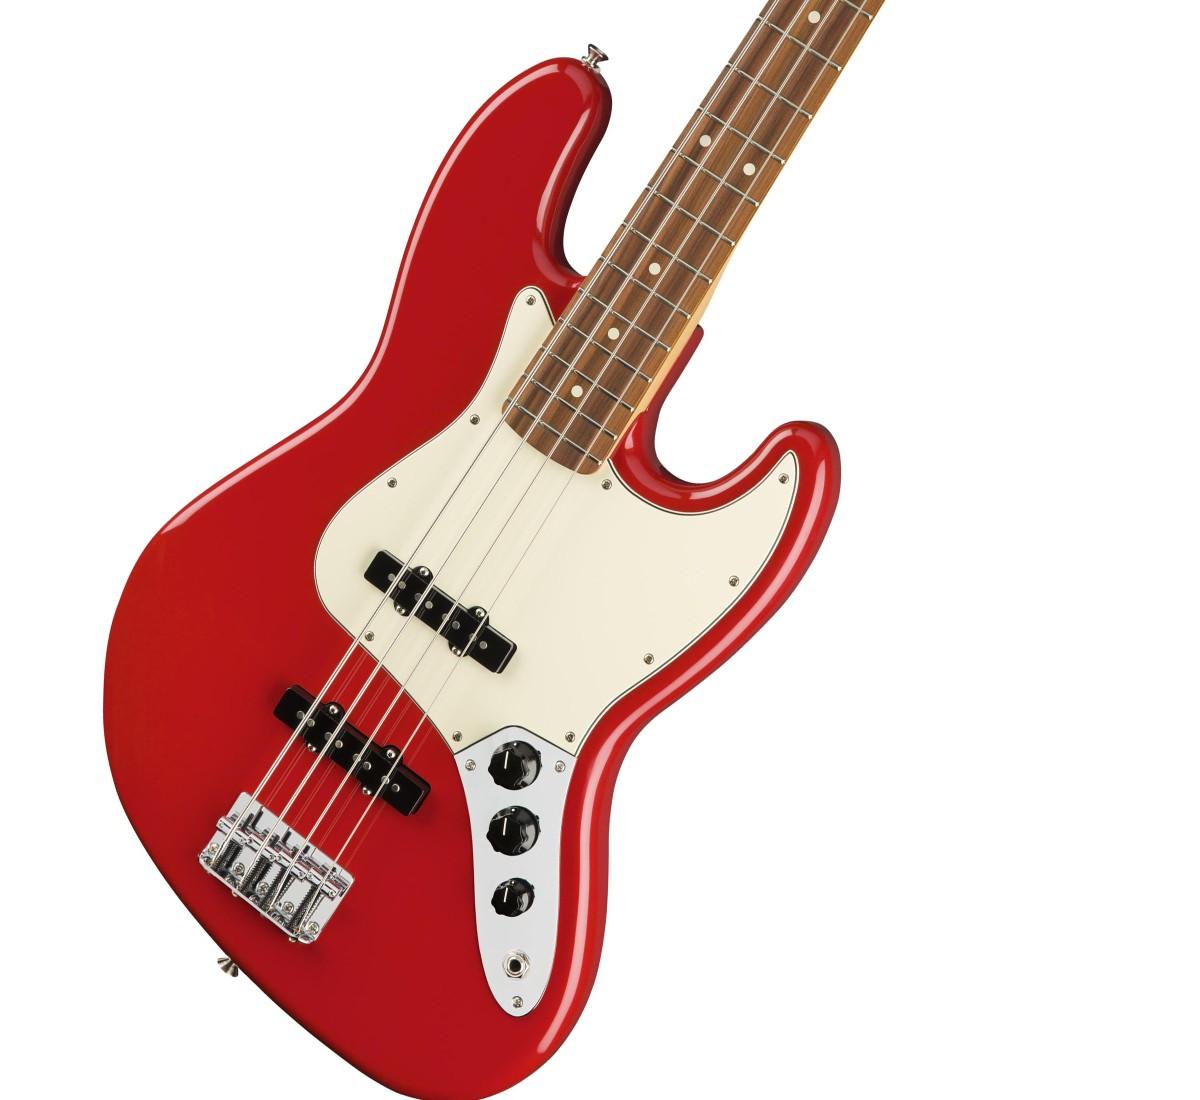 Fender Player Series Jazz Bass Sonic Red Pau Ferro Fingerboard 池袋店 七夕祭り 無条件返品・交換 結婚祝